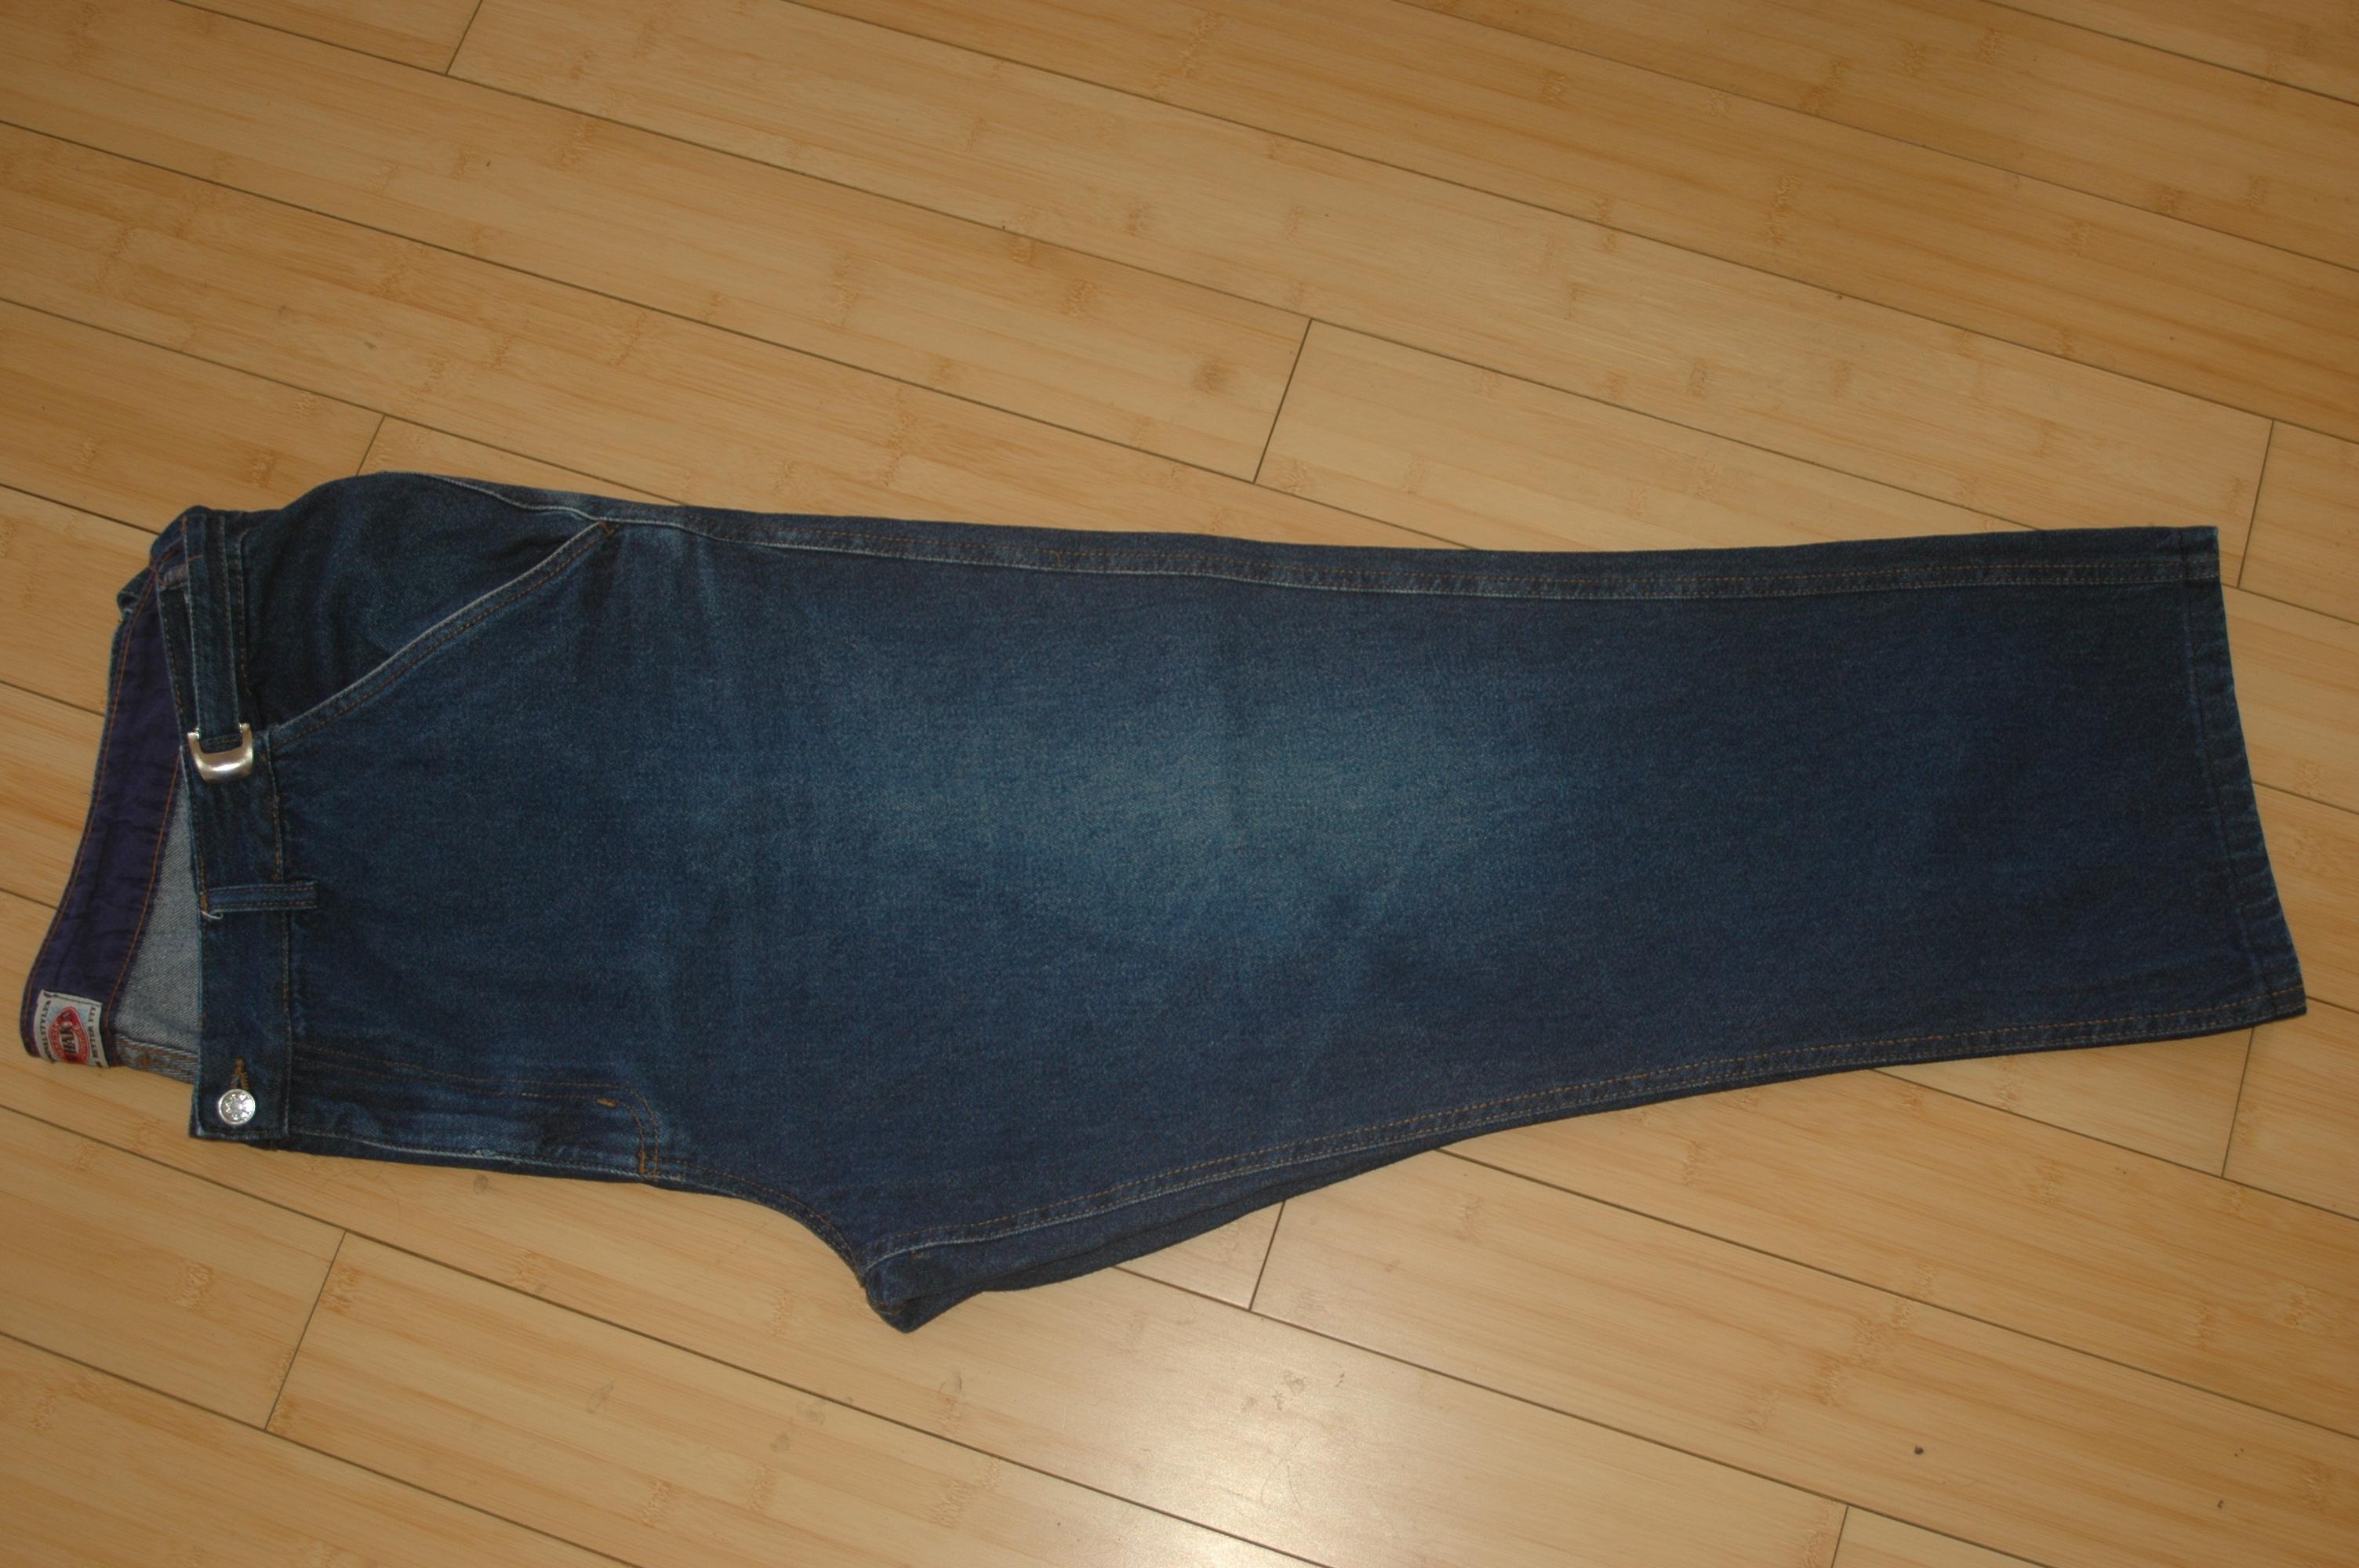 troc de troc jean homme taille 58 image 0